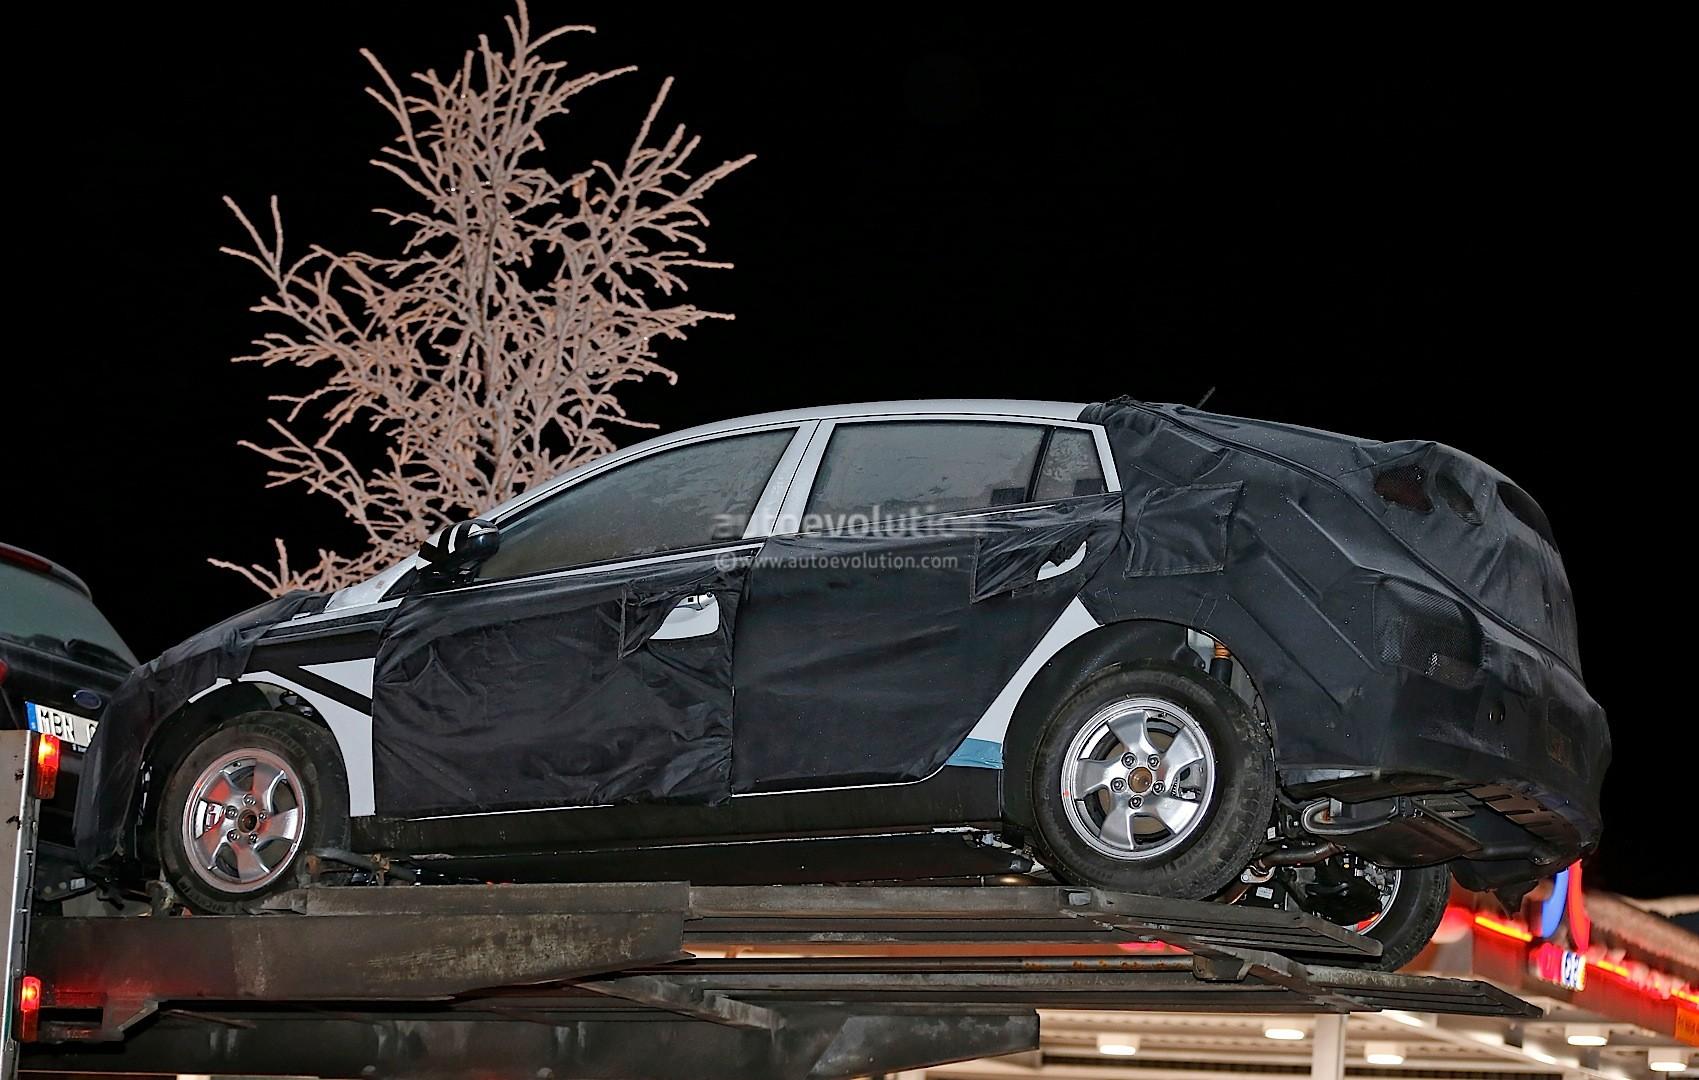 2016 - [Hyundai] Ioniq Hybrid-hyundai-elantra-like-prototype-spied-to-start-production-in-2016-photo-gallery_5